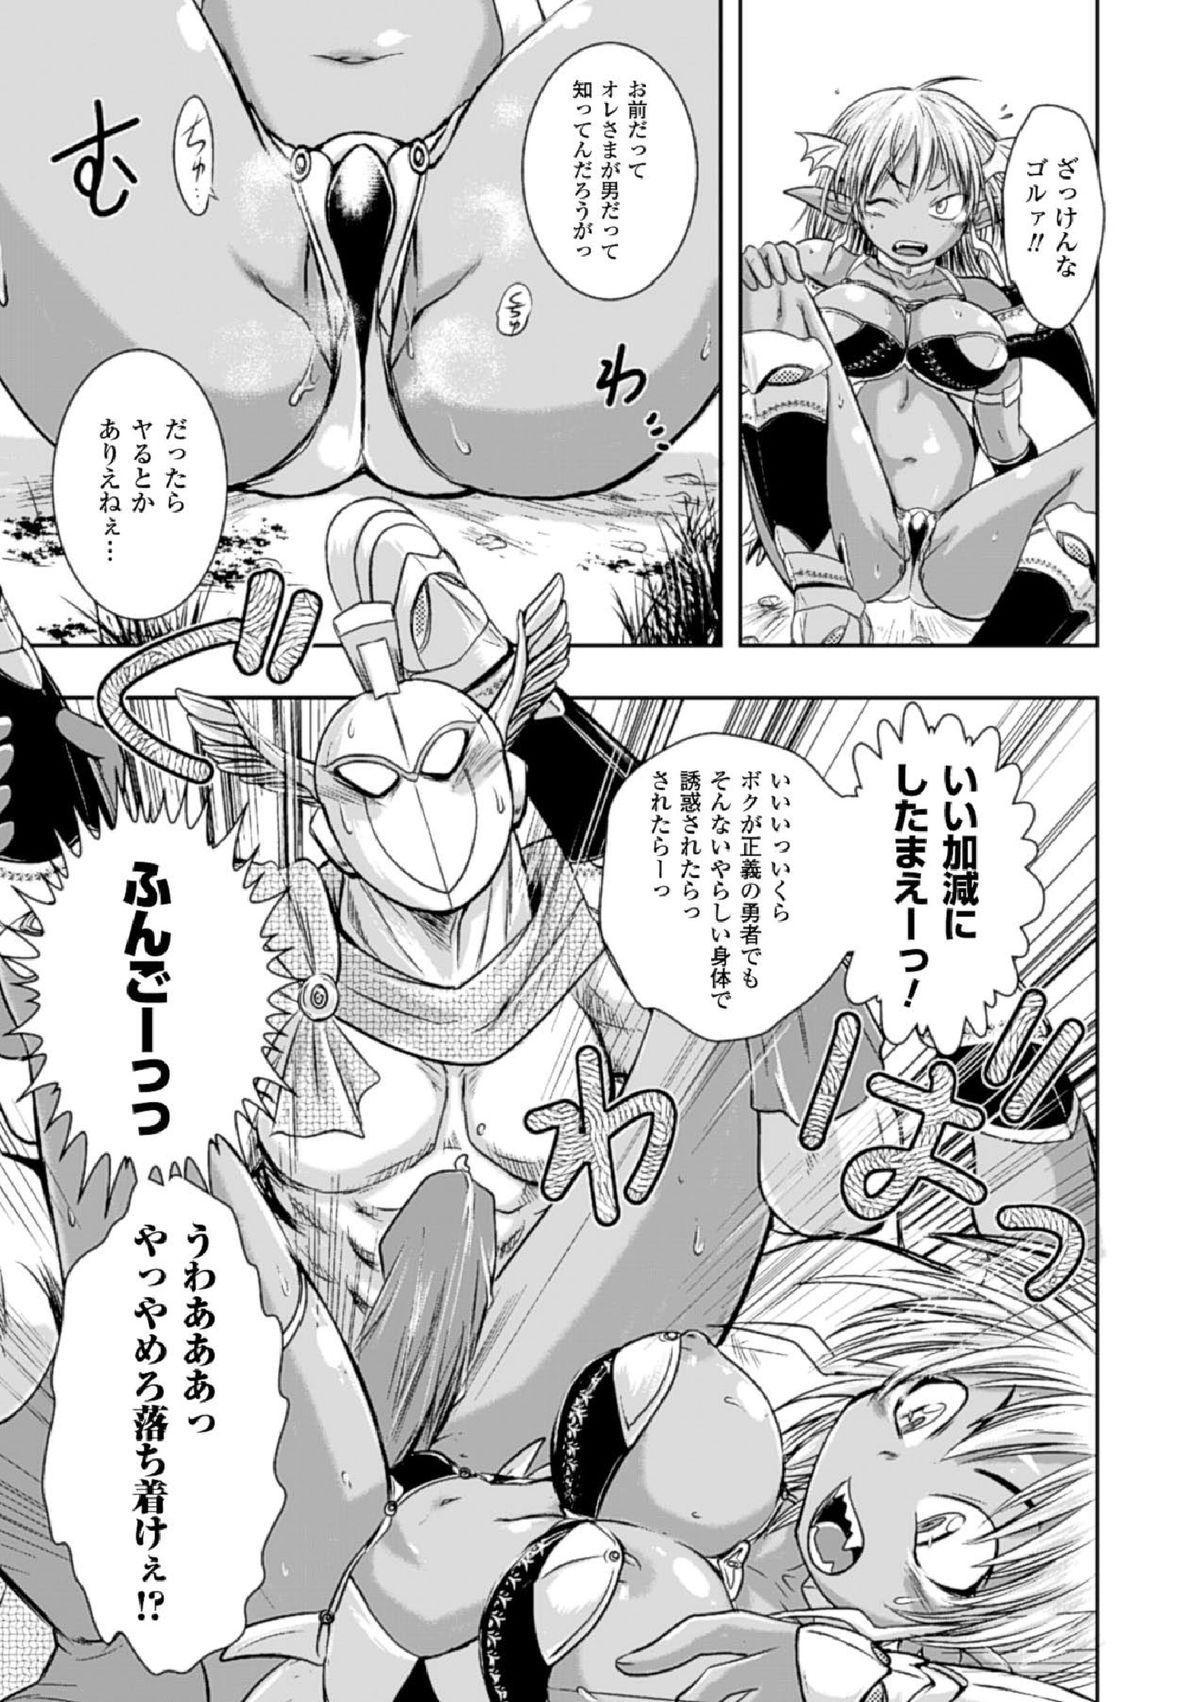 Haiboku Heroine Kaizou Choukyou Inferno 54